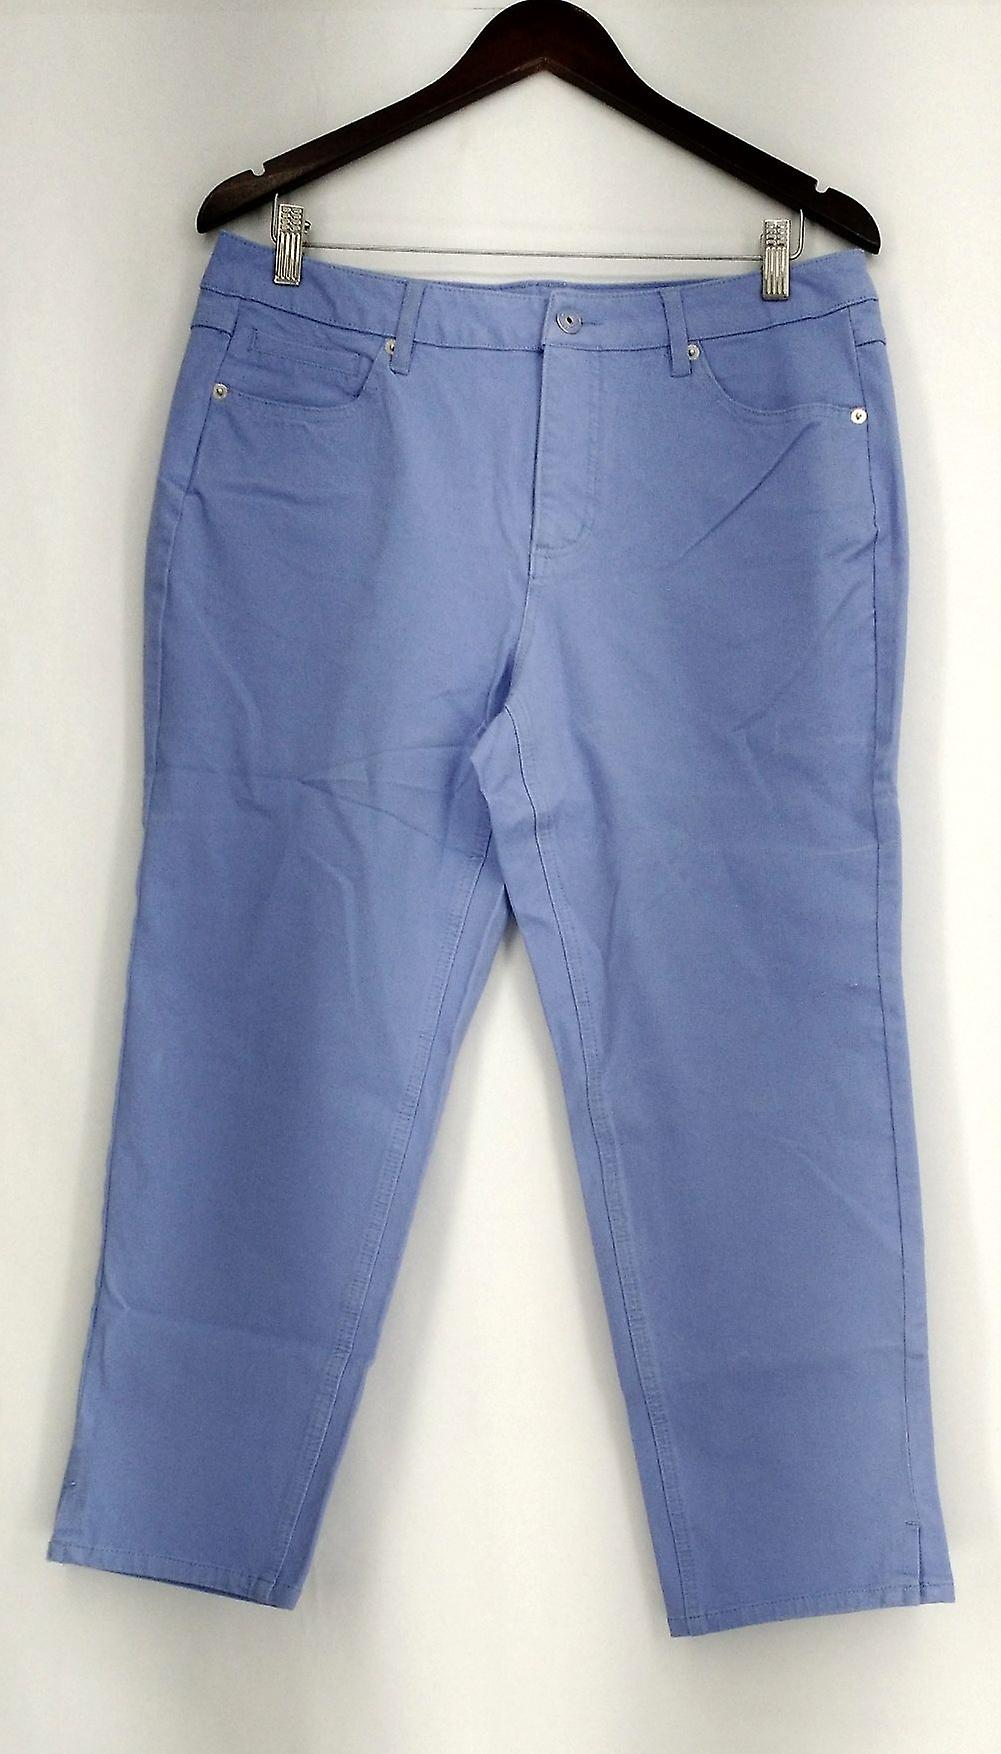 Isaac Mizrahi Live! Petite Jeans 24/7 Colored Denim Ankle Length Blue